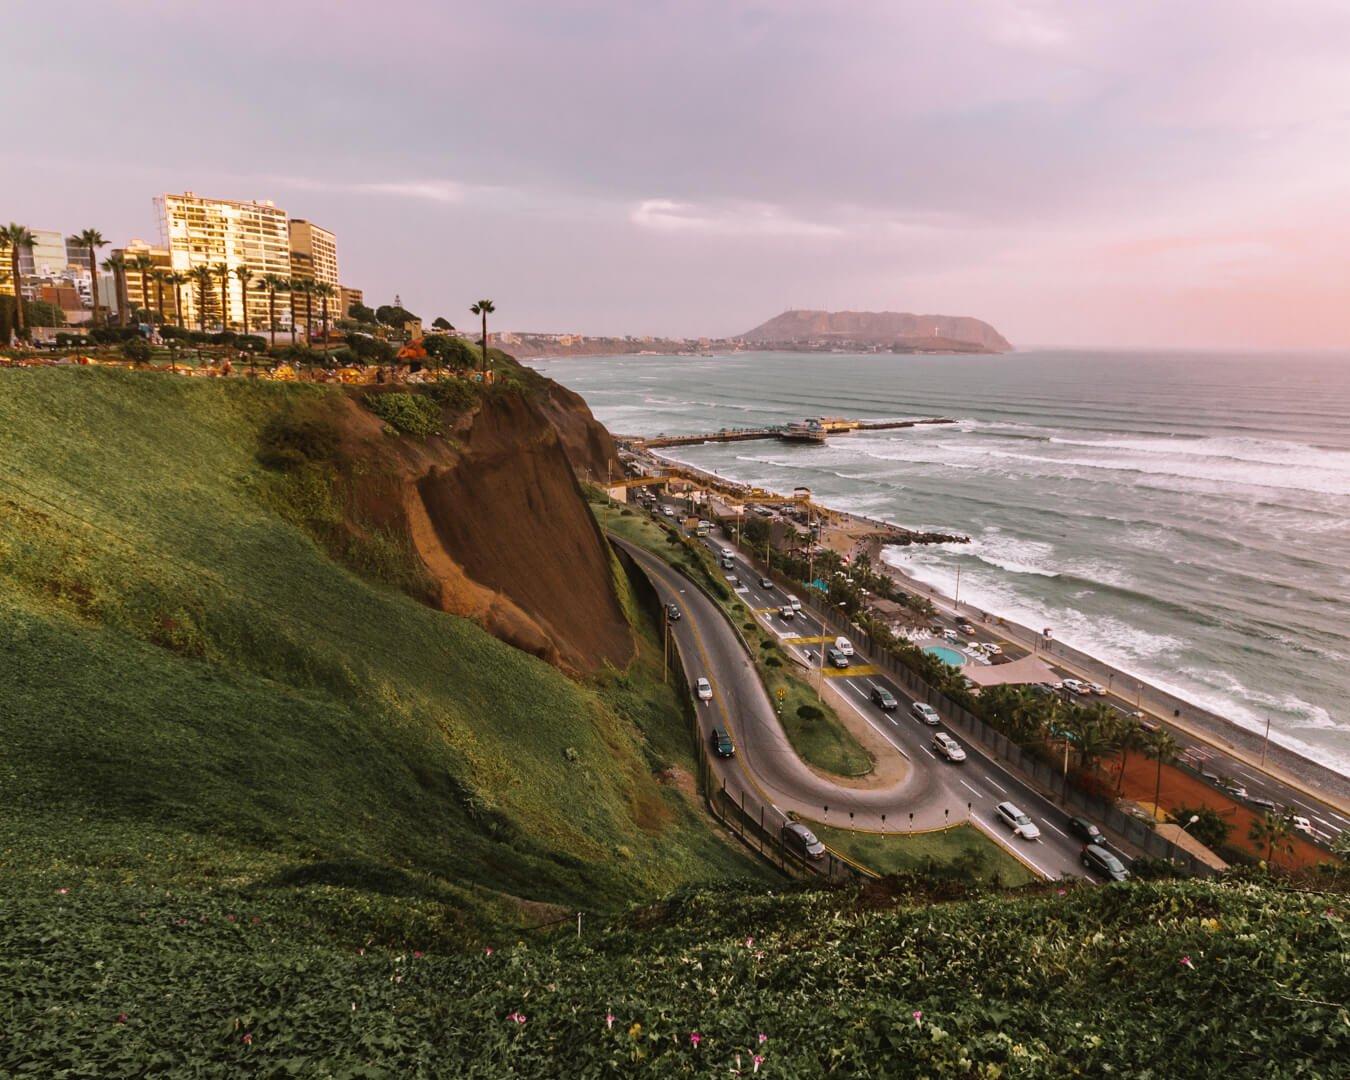 Lima, Peru - Miraflores